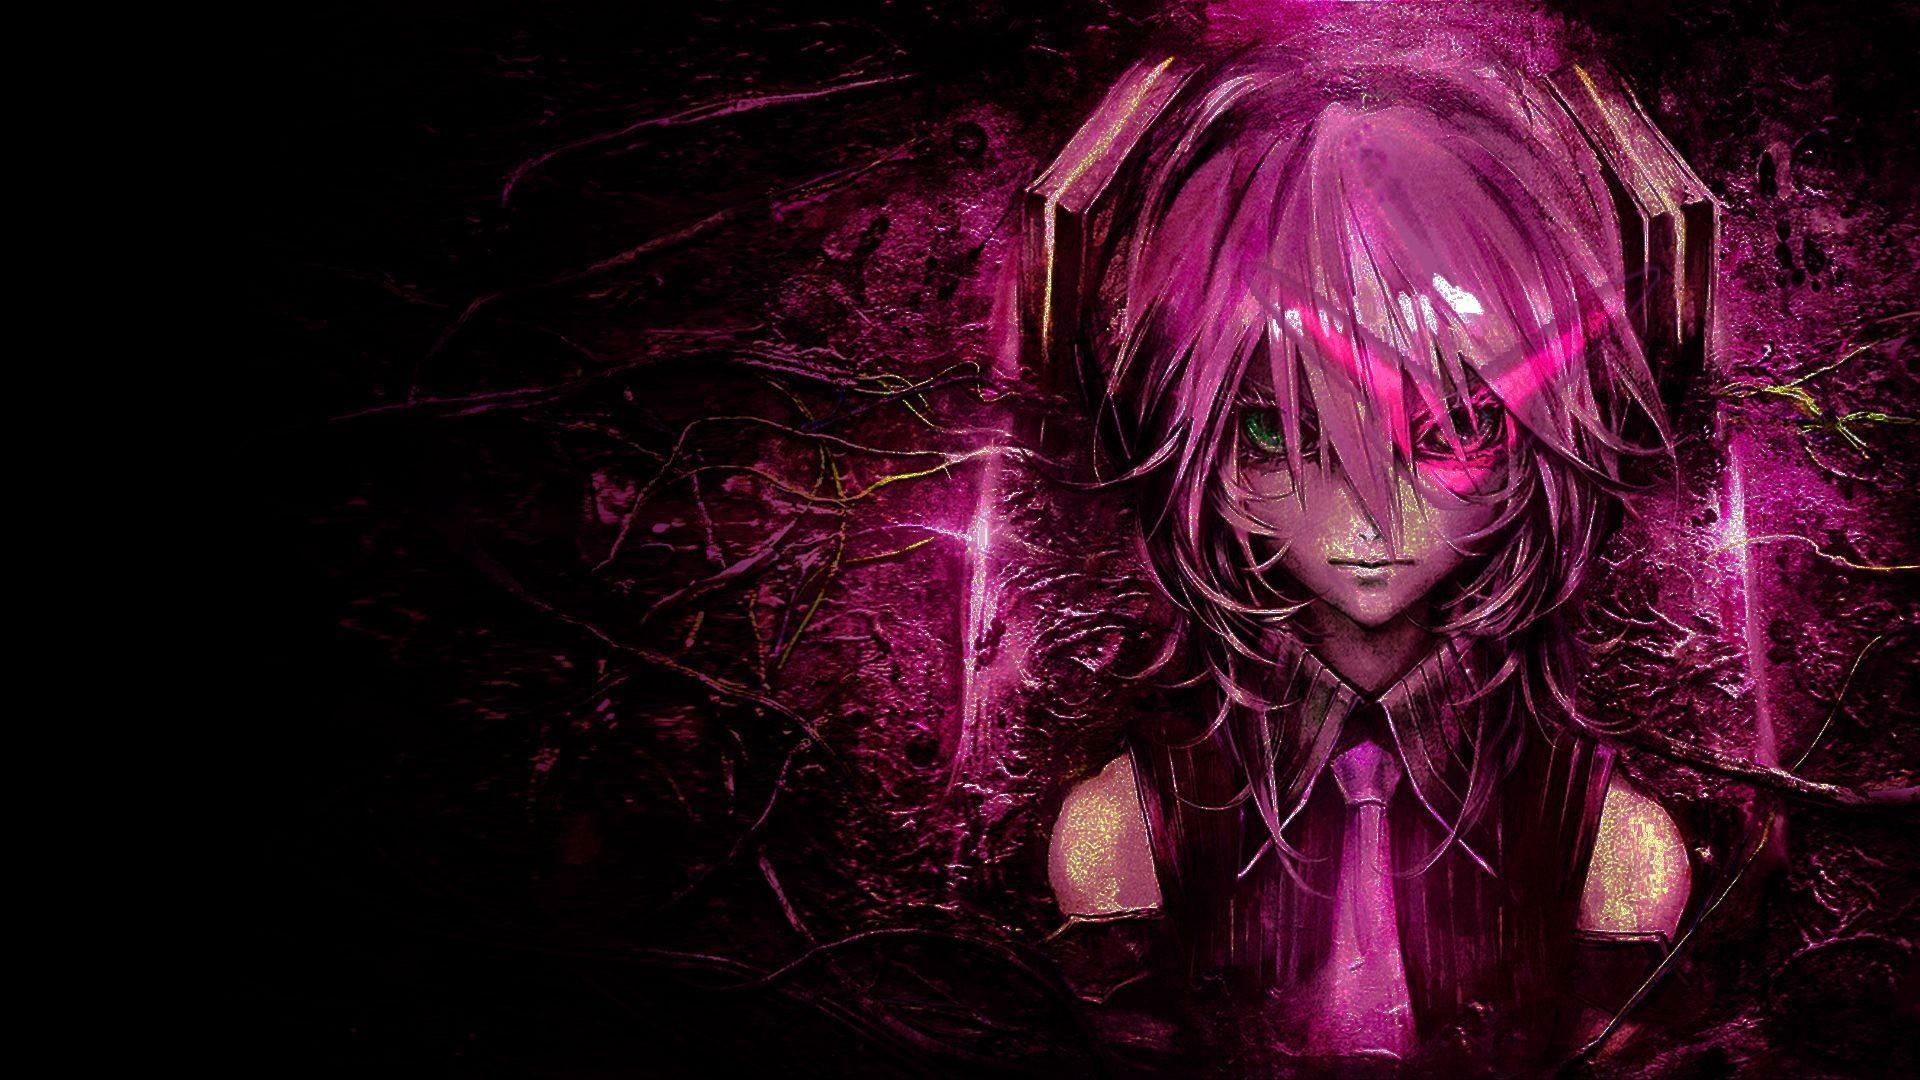 Badass anime wallpaper 65 images - Anime wallpaper black background ...